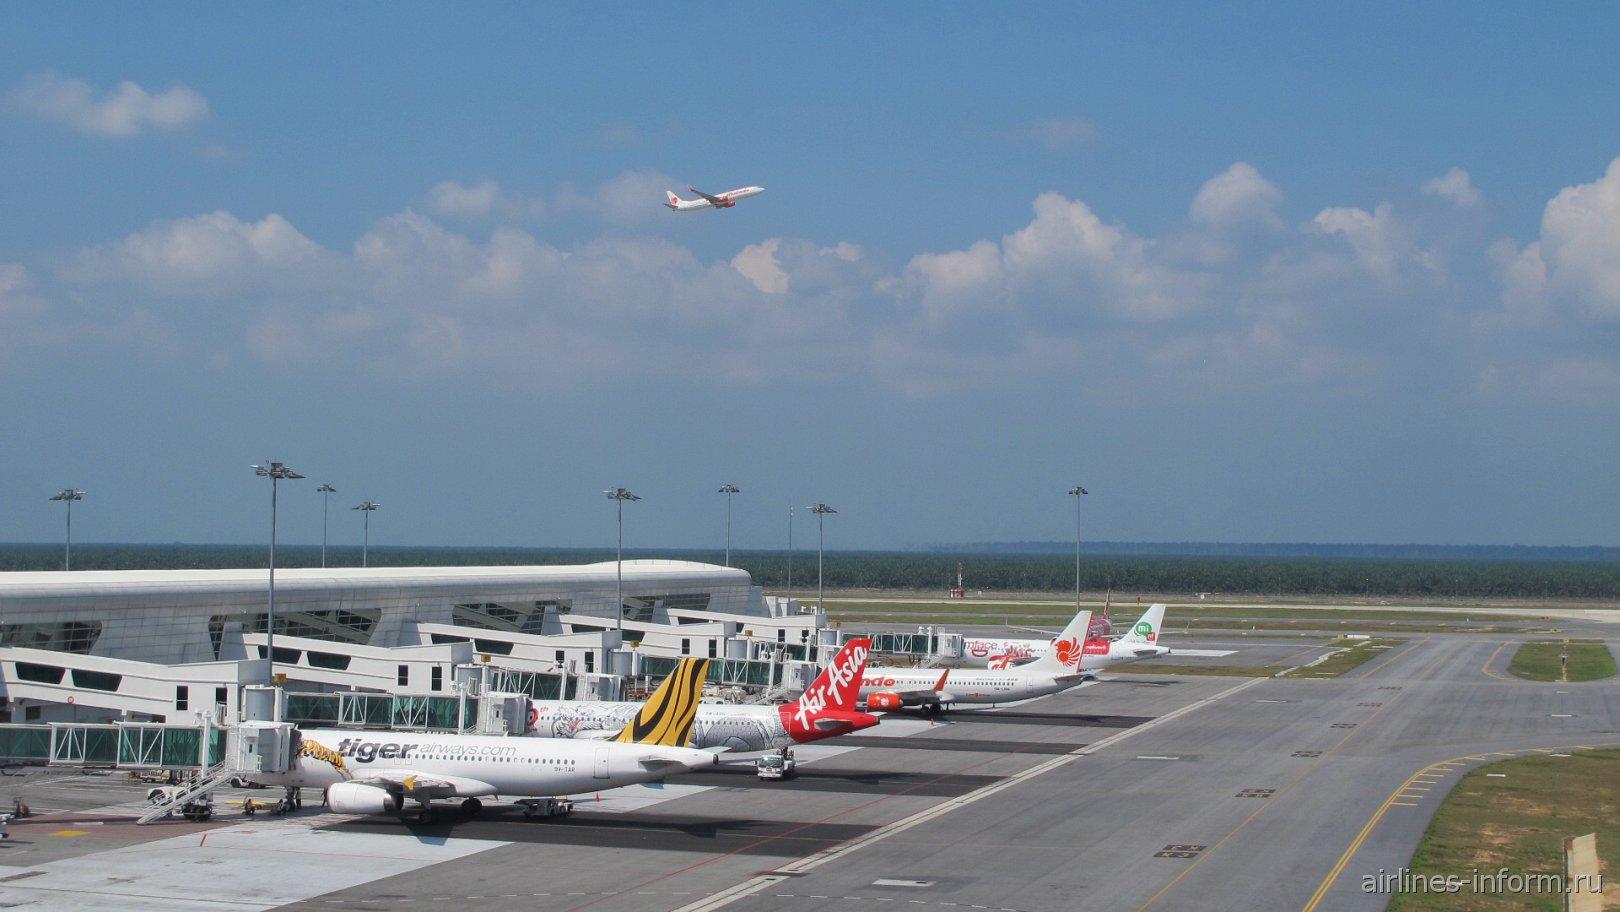 Гейты лоукост-терминала KLIA2 аэропорта Куала-Лумпур